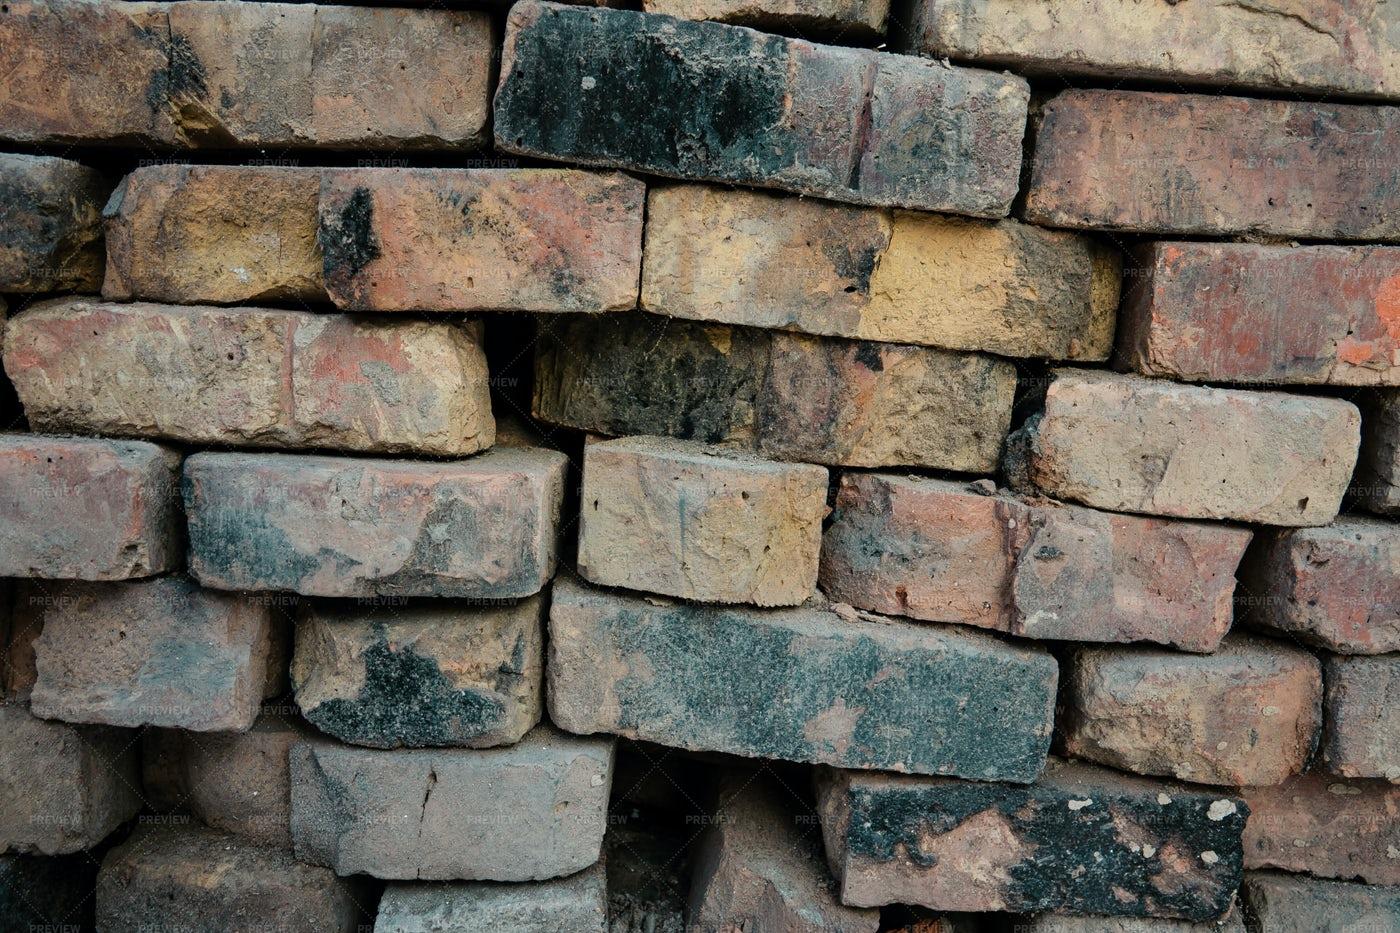 Texture Of Old Bricks: Stock Photos